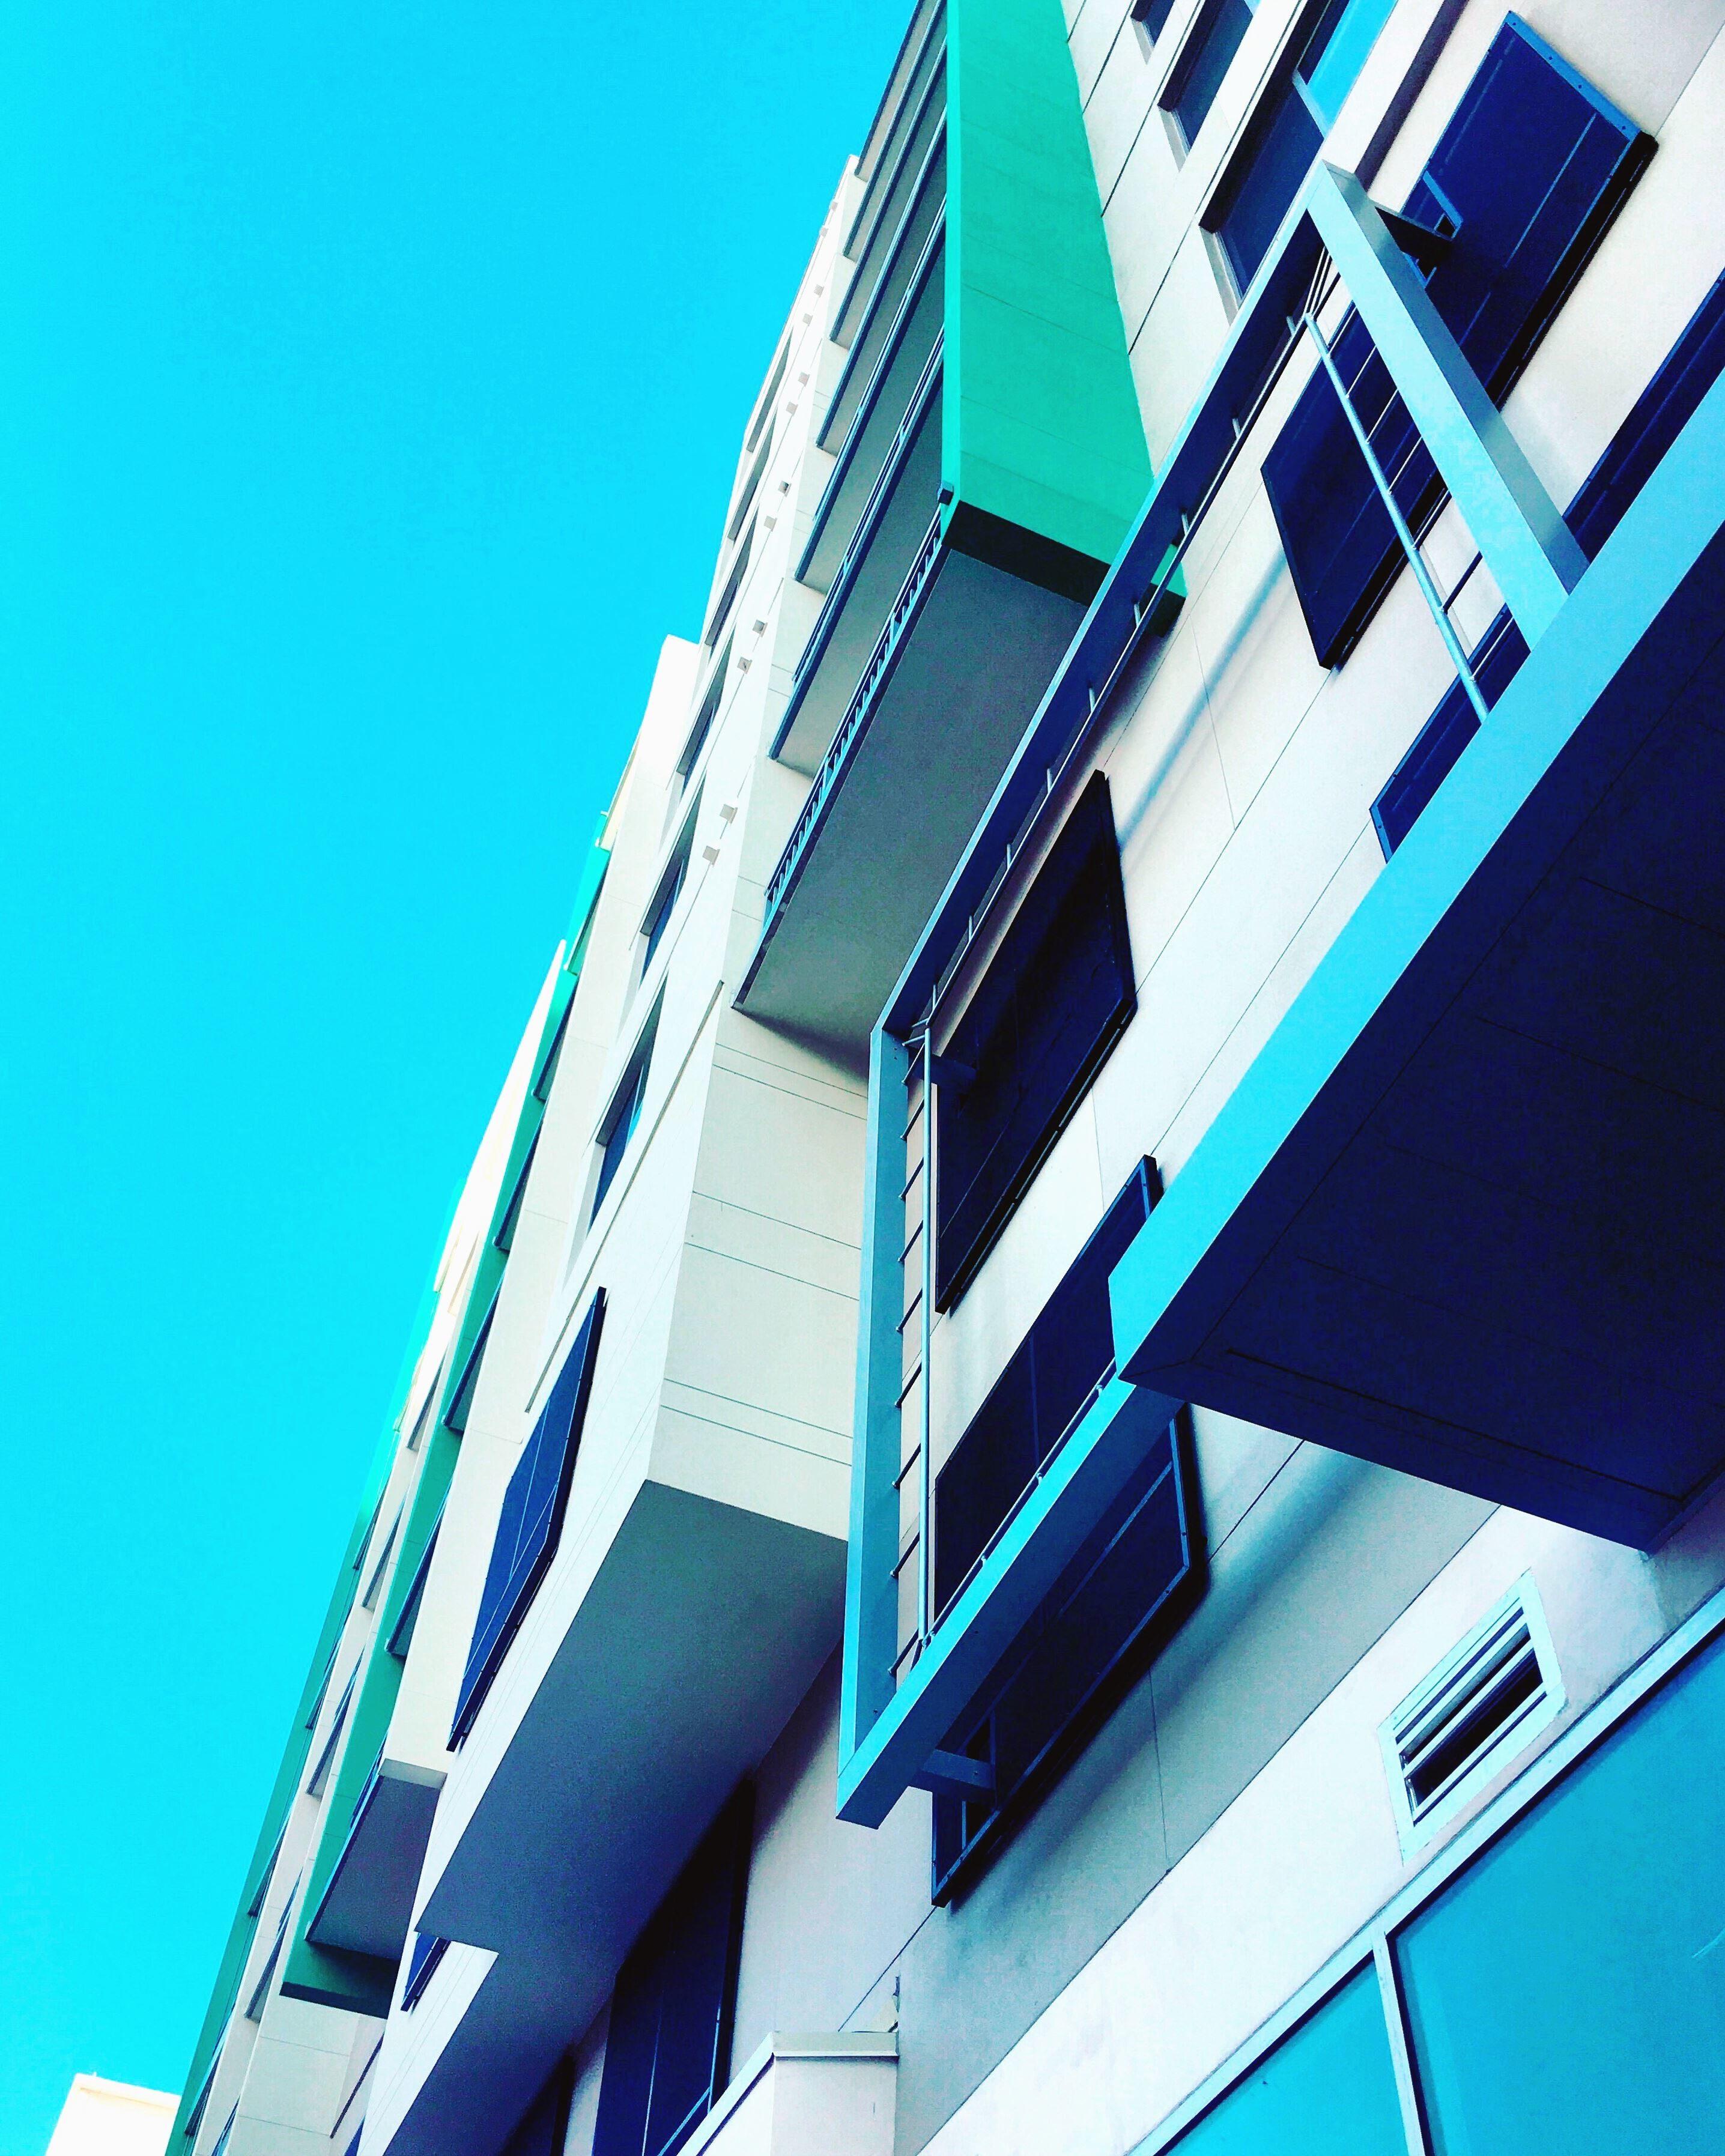 Imagen Gratis Moderno Edificio Arquitectura Colores